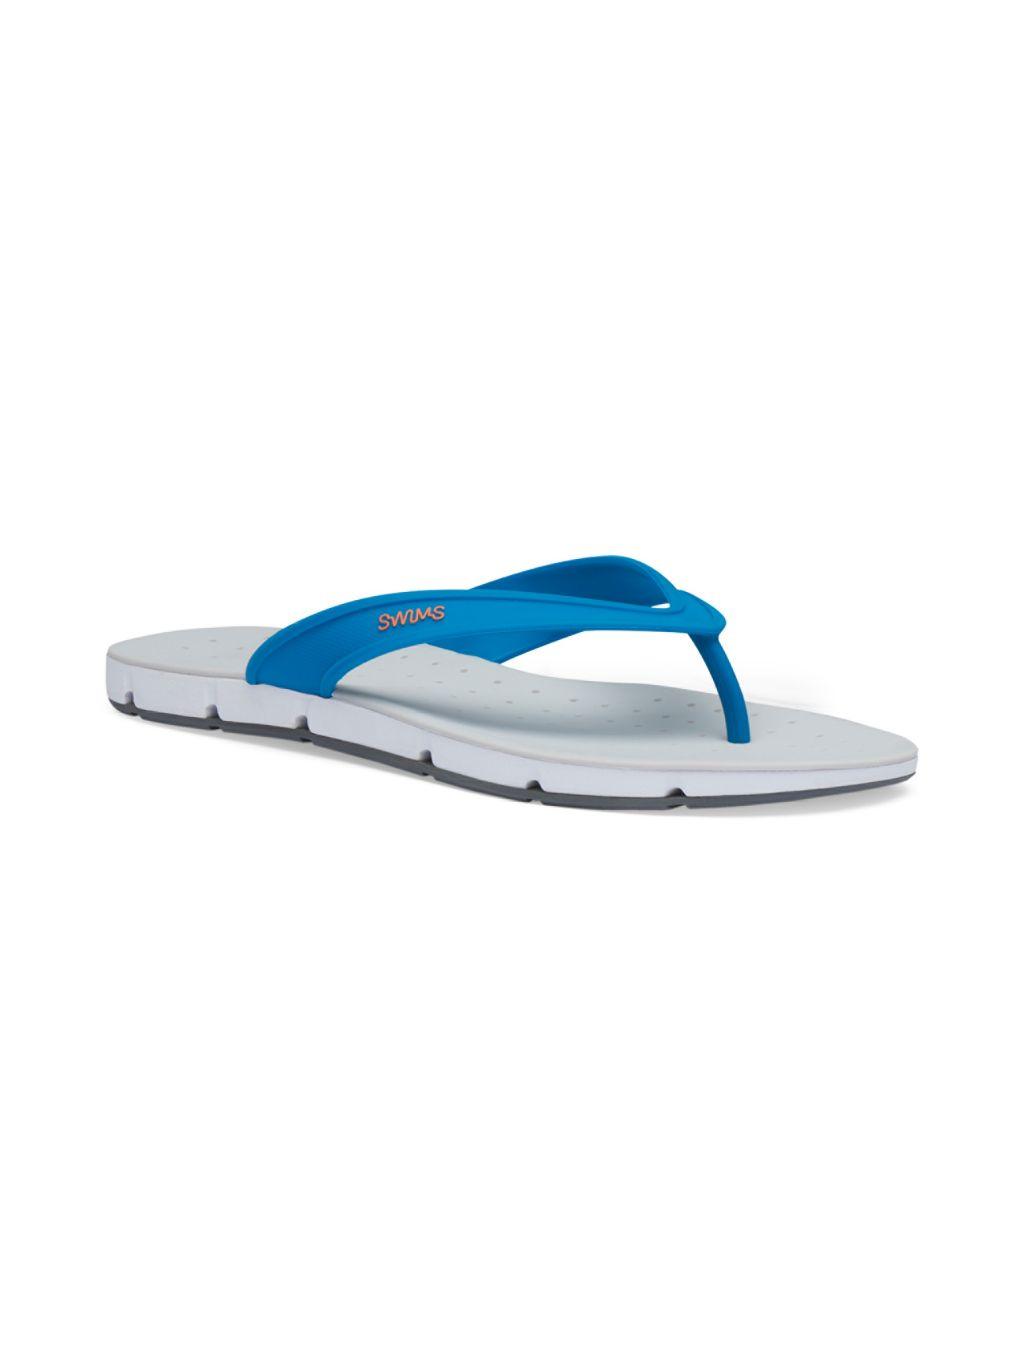 Swims Breeze Thong Flat Sandals